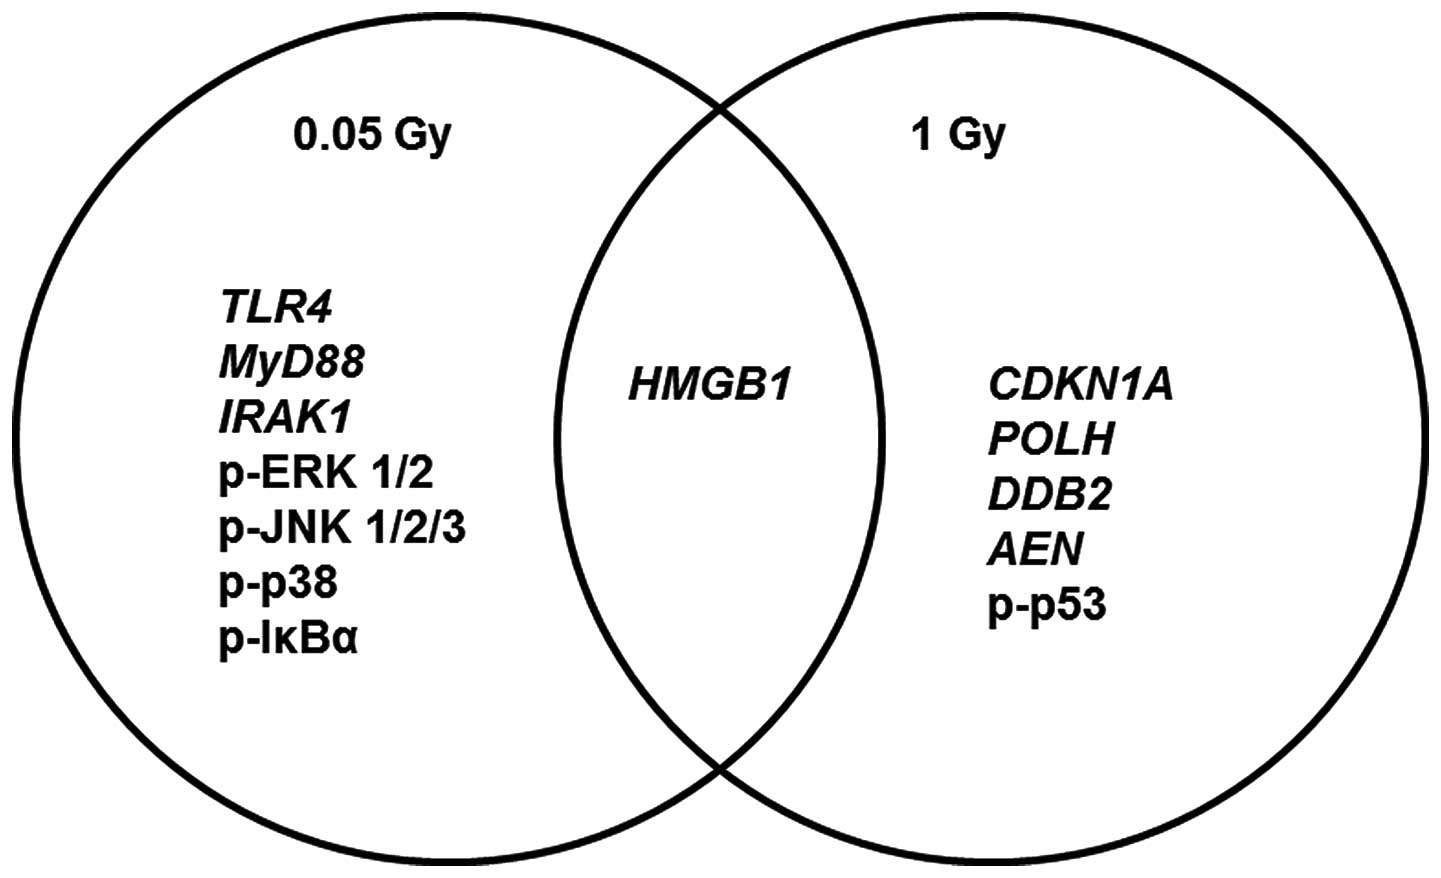 Low Doses Of Ionizing Radiation Induce Immune Stimulatory Responses In Isolated Human Primary